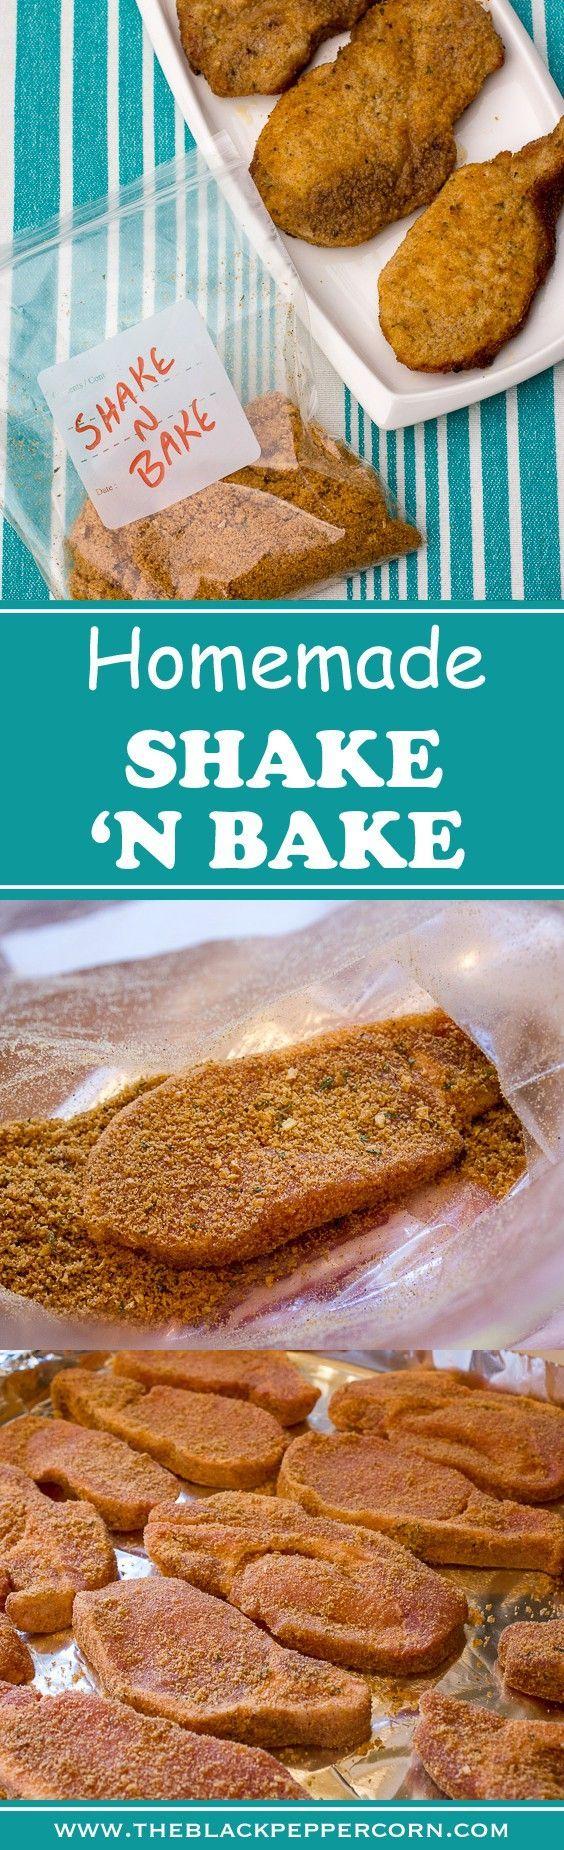 Homemade Shake n Bake Copycat Kraft Recipe - Great for Pork and Chicken